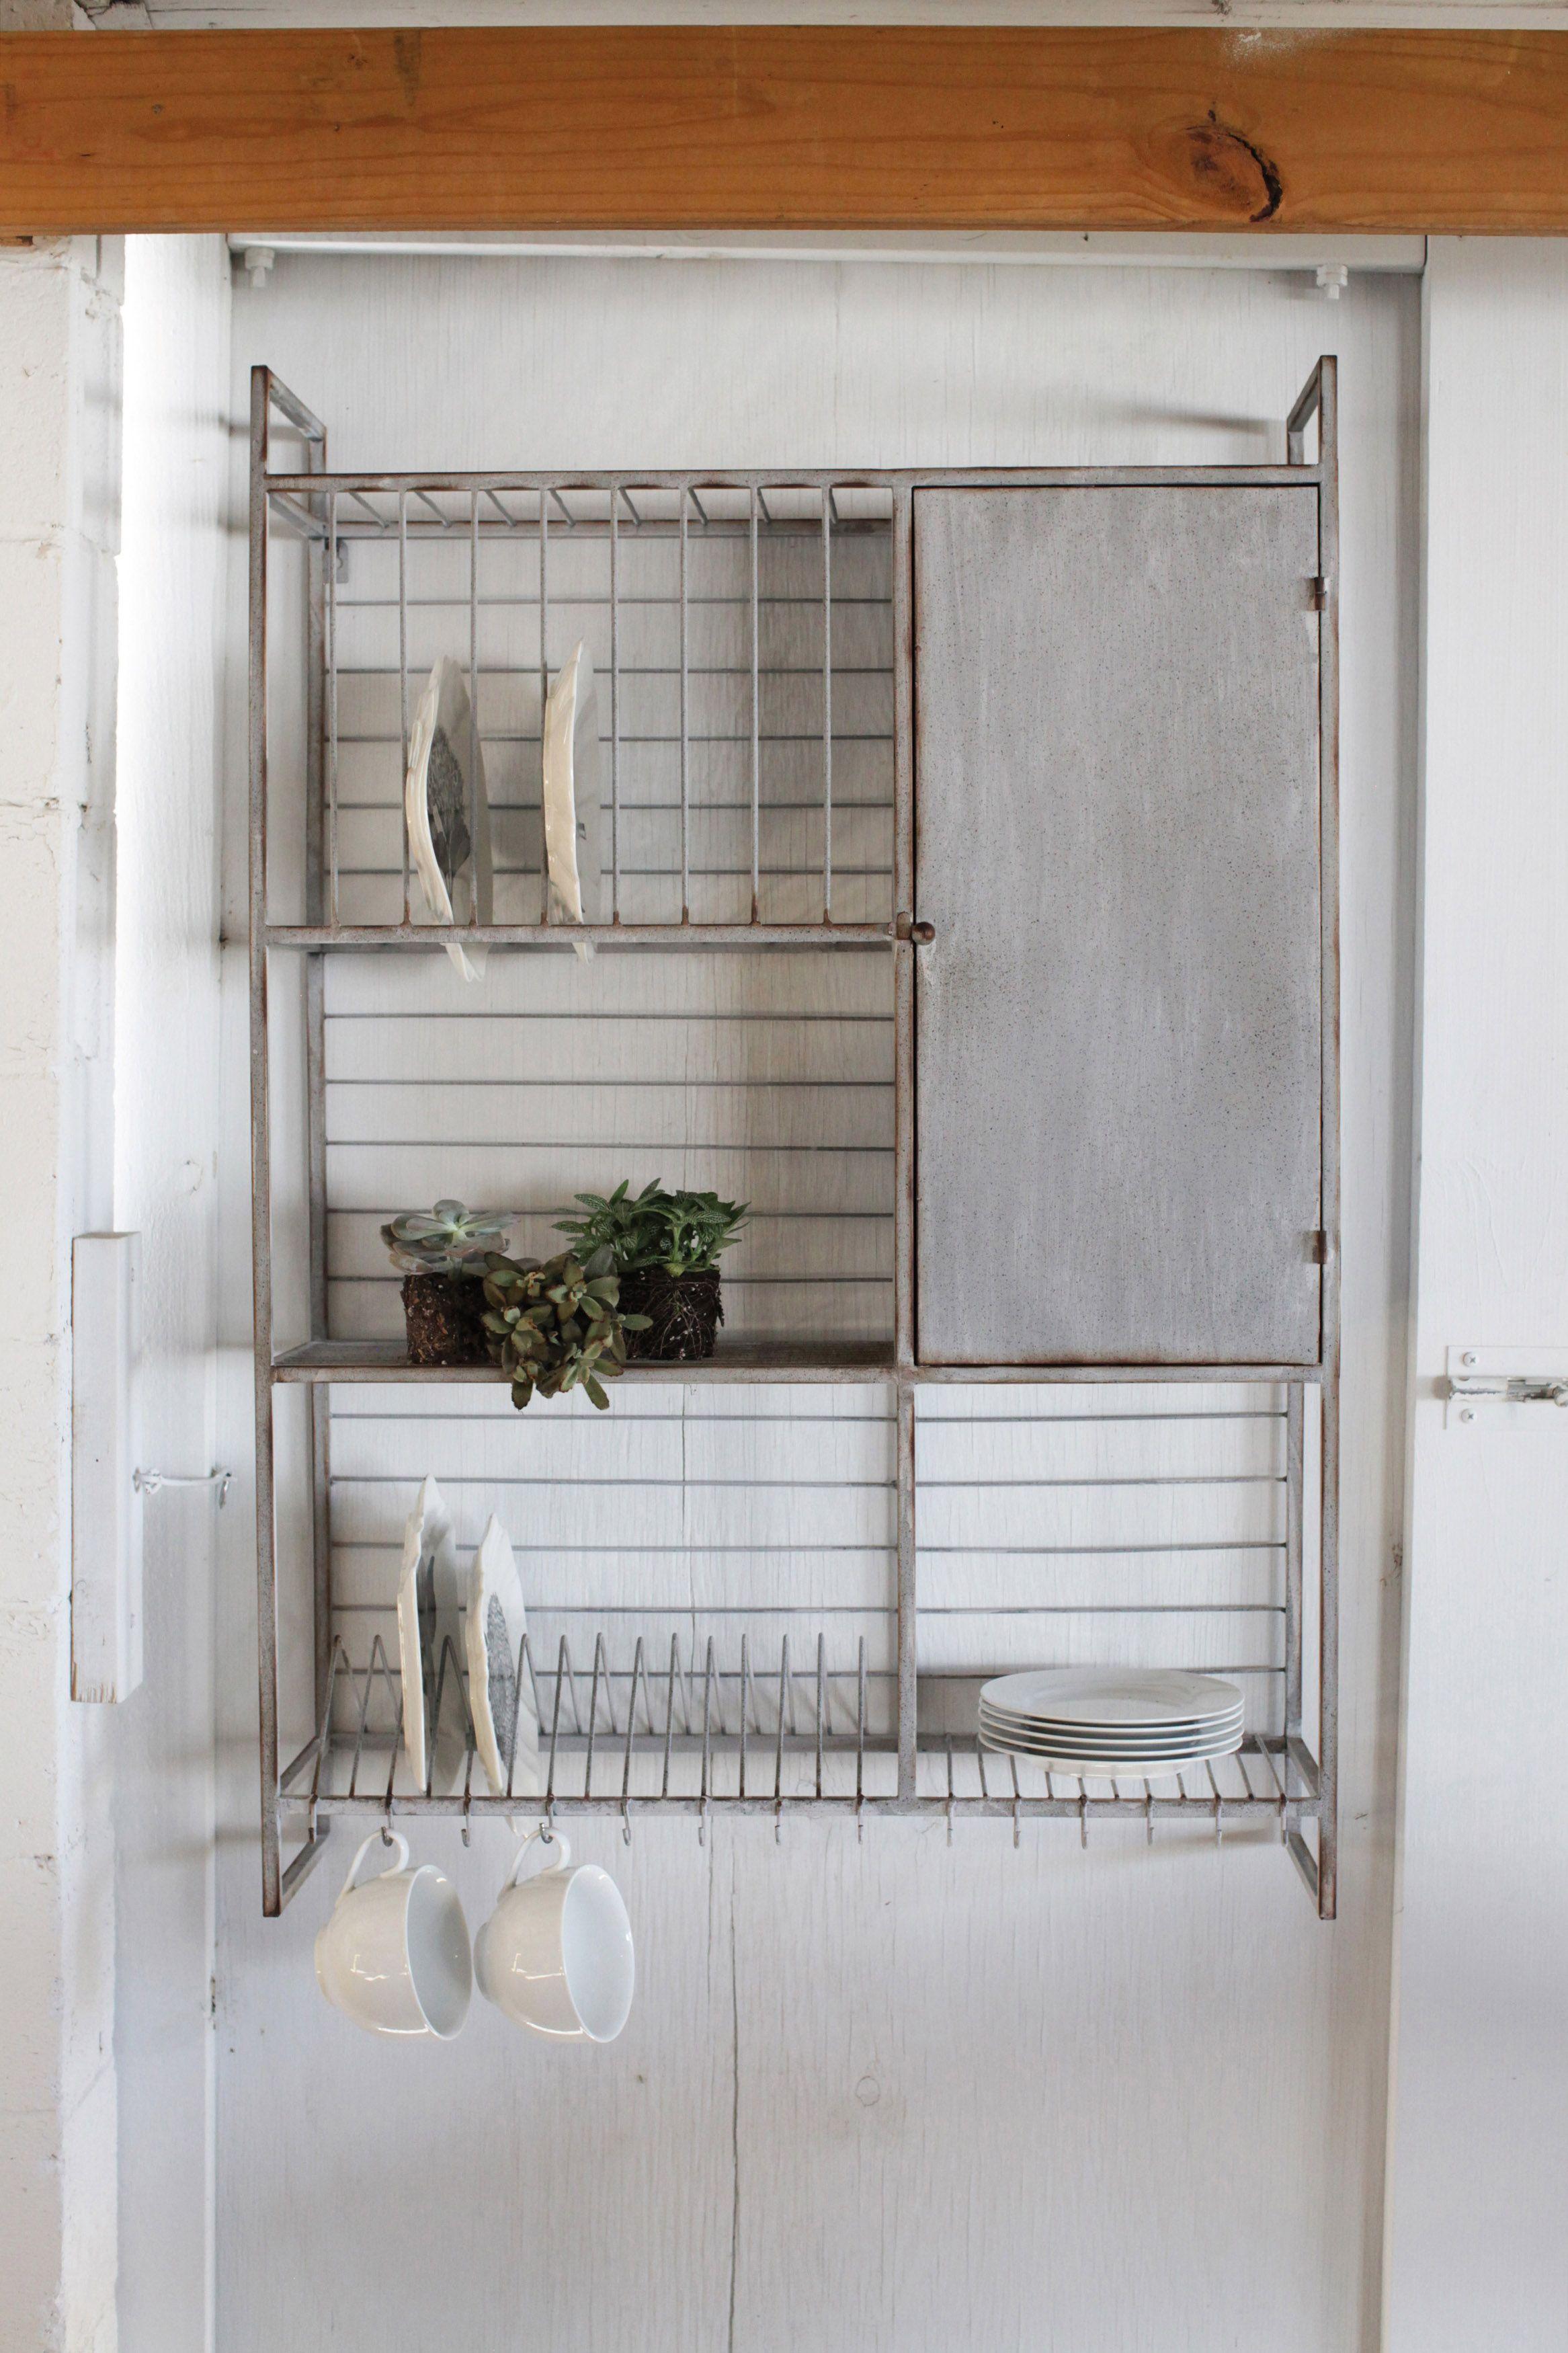 Distressed Metal Wall Rack with Shelves u0026 by ICandyforthehome & The G.Miles Files 31-3/4u2033L x 46u2033H Metal Wall Rack w Shelves u0026 Hooks ...